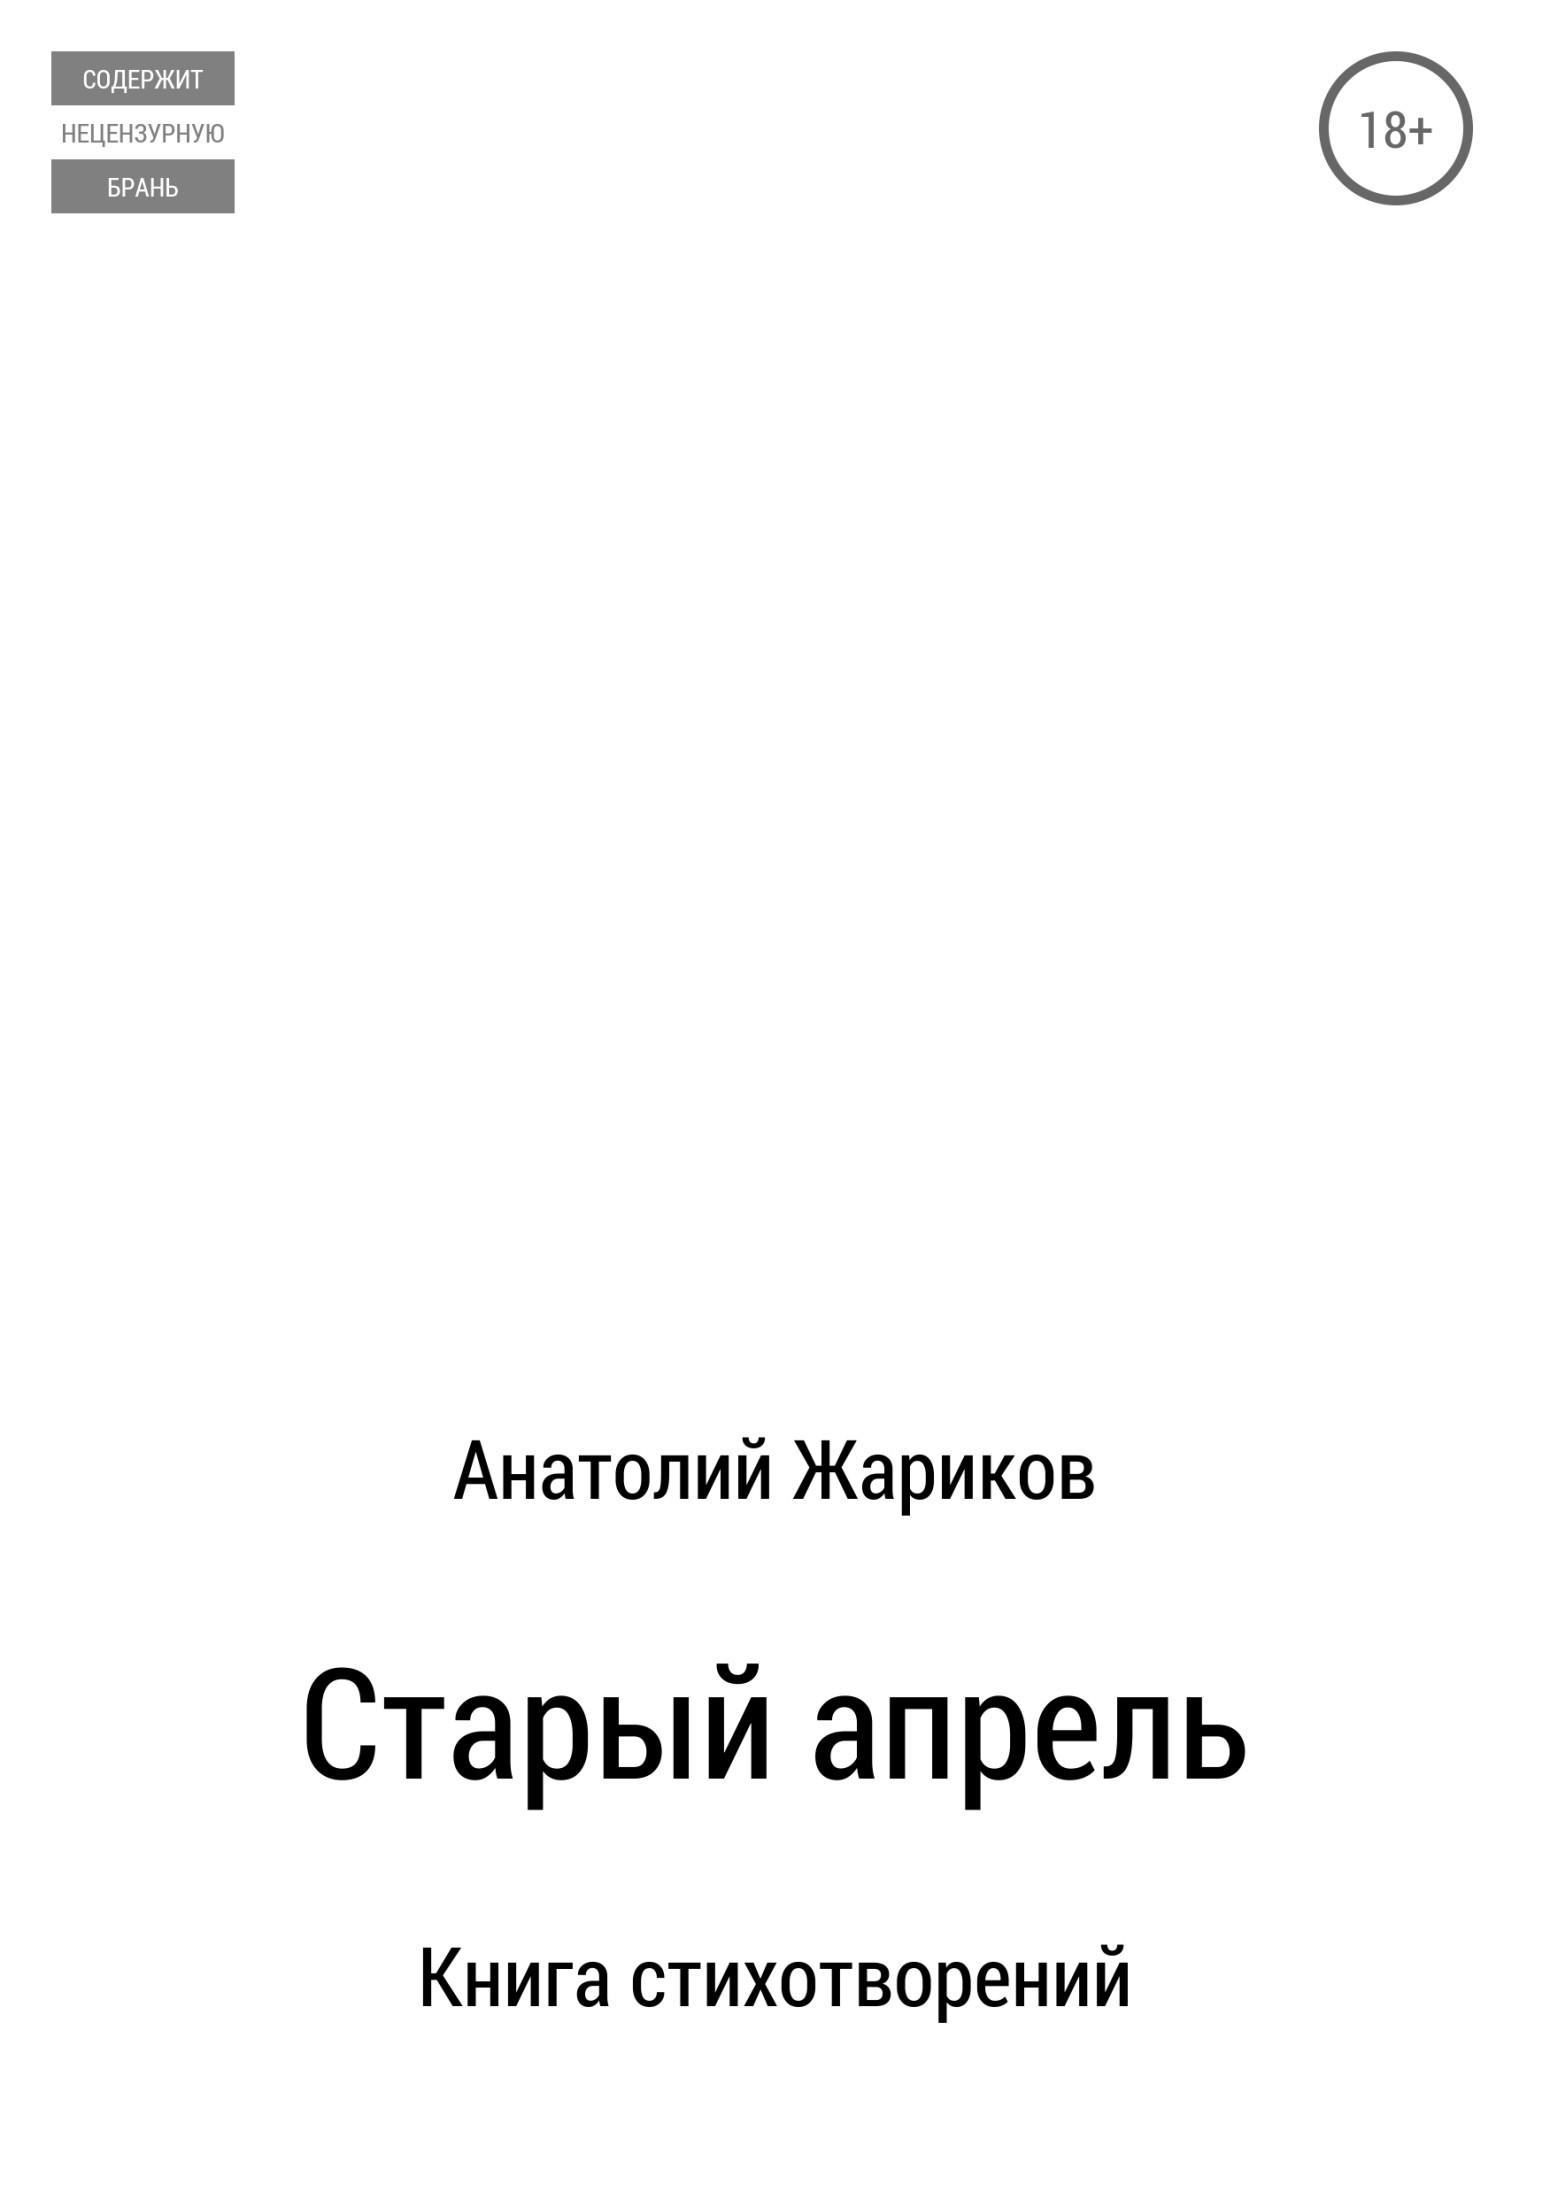 Анатолий Жариков Старый апрель. Сборник стихотворений